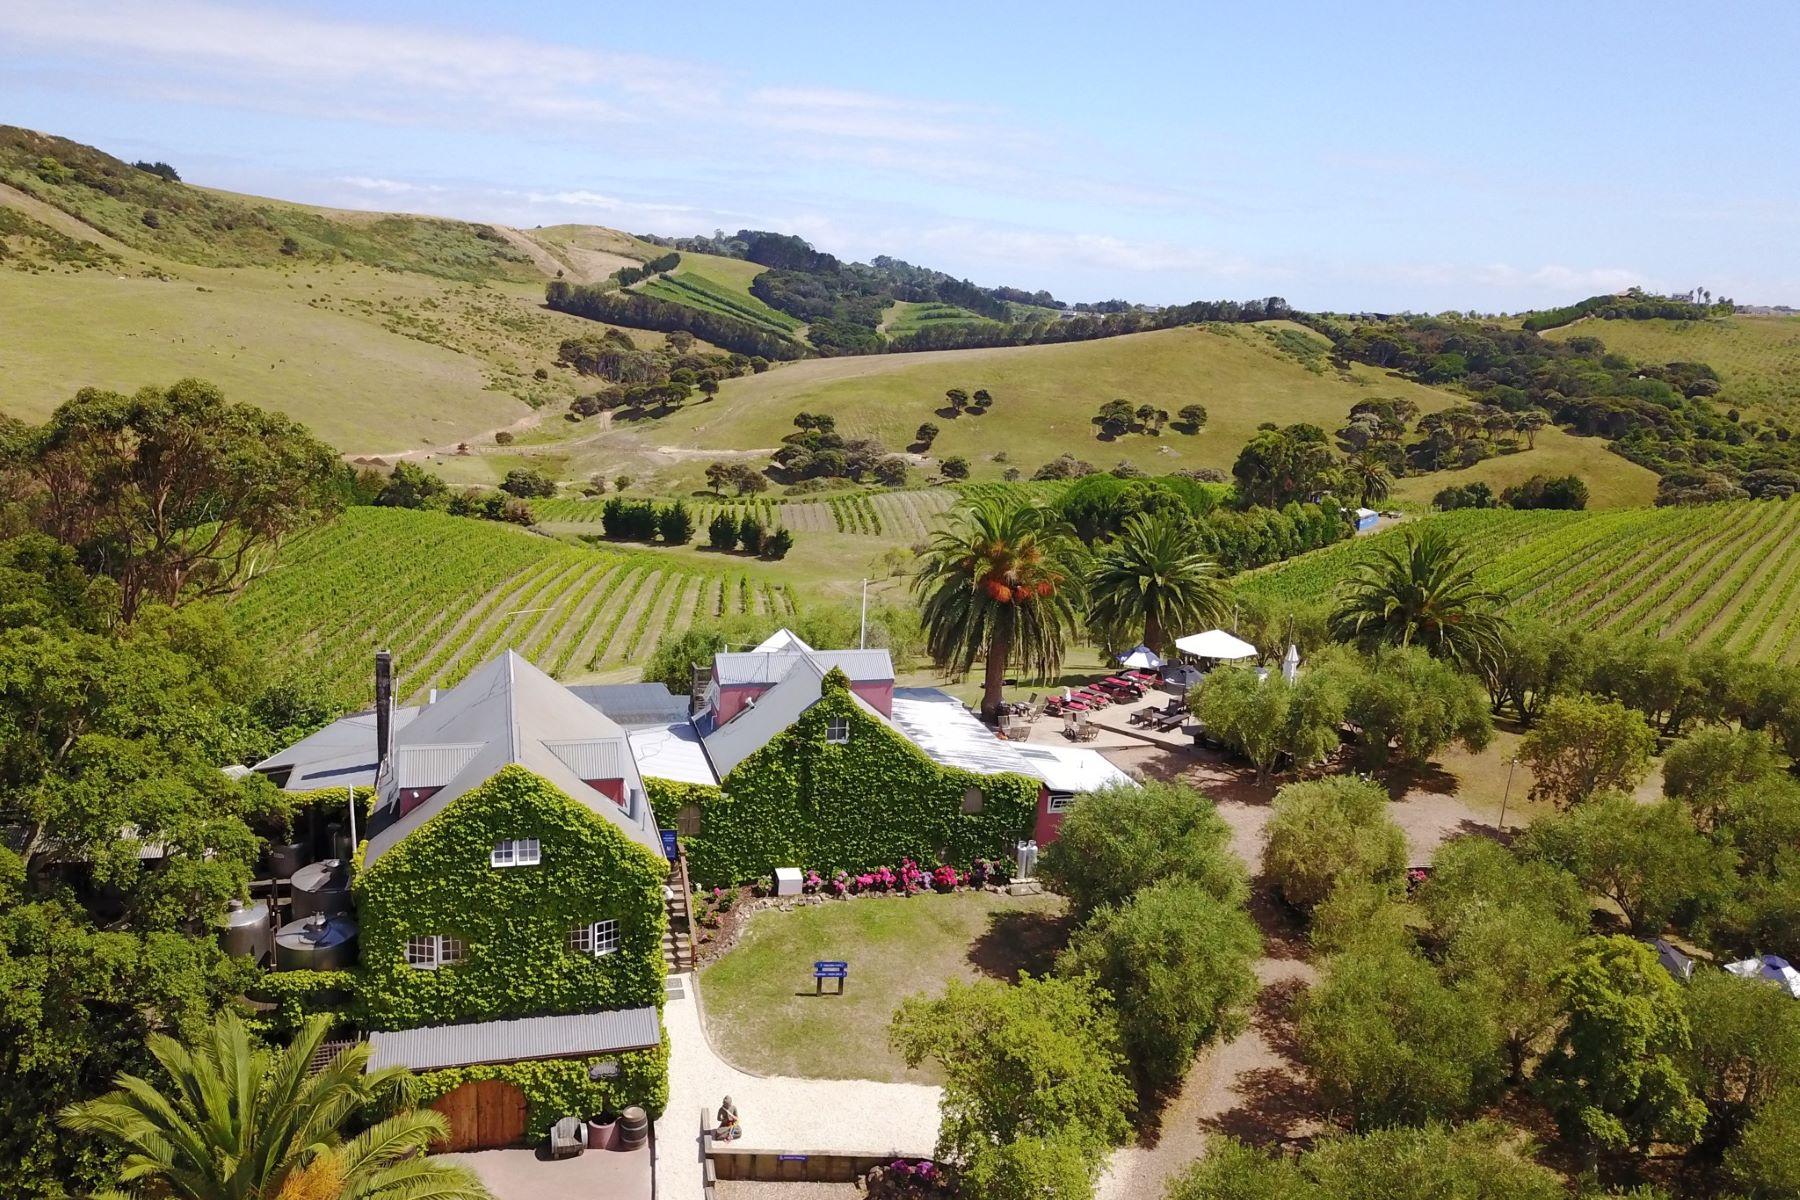 Vineyard Real Estate for Sale at Stonyridge Vineyard Auckland, Auckland New Zealand